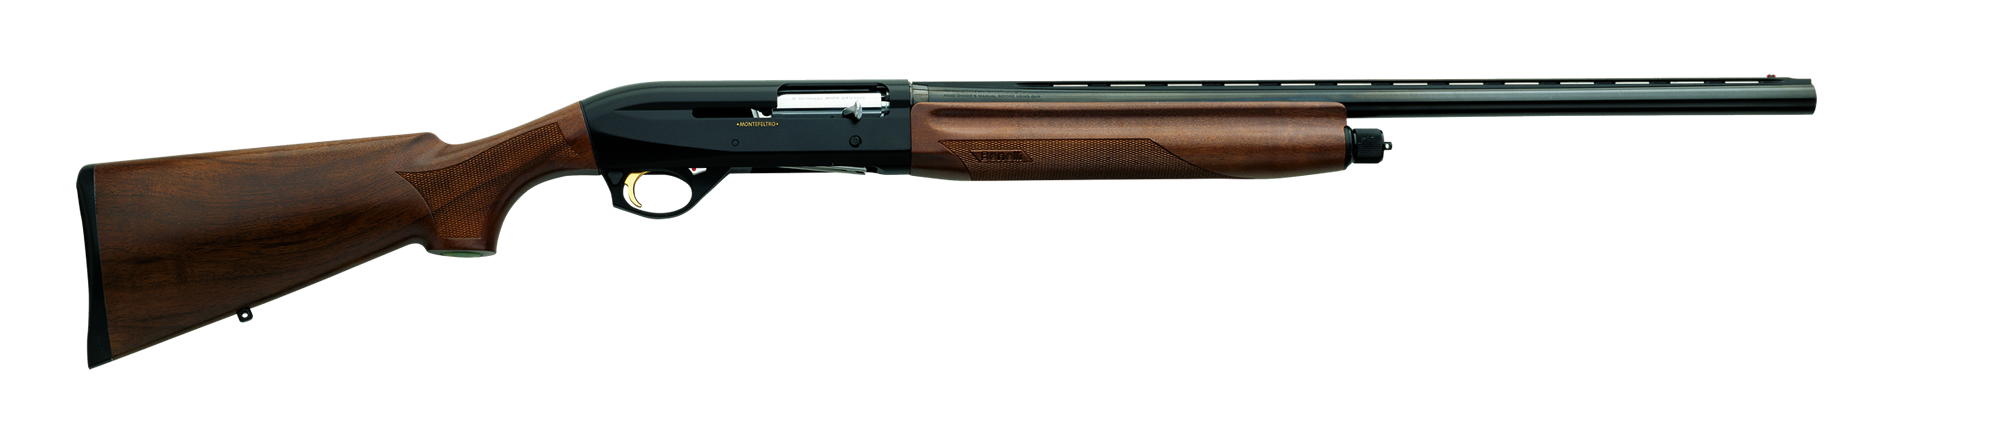 Escopeta BENELLI, modelo EXTRALIGHT, calibre 12/76-0